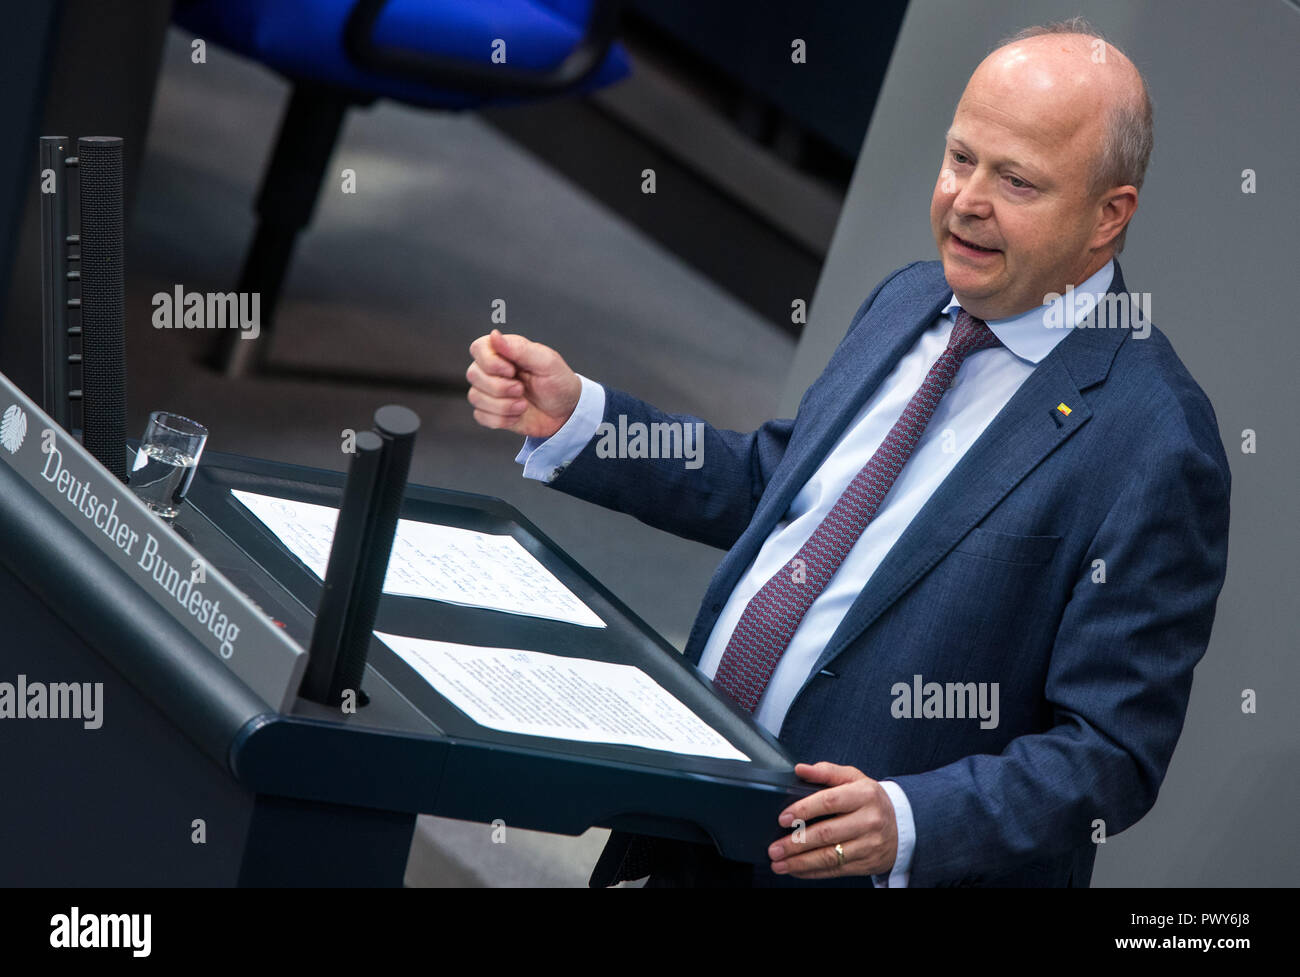 Berlin, Germany. 18th Oct, 2018. Michael Theurer, member of the Bundestag of the FDP faction, speaks in the Bundestag. Credit: Jens Büttner/dpa-Zentralbild/dpa/Alamy Live News - Stock Image